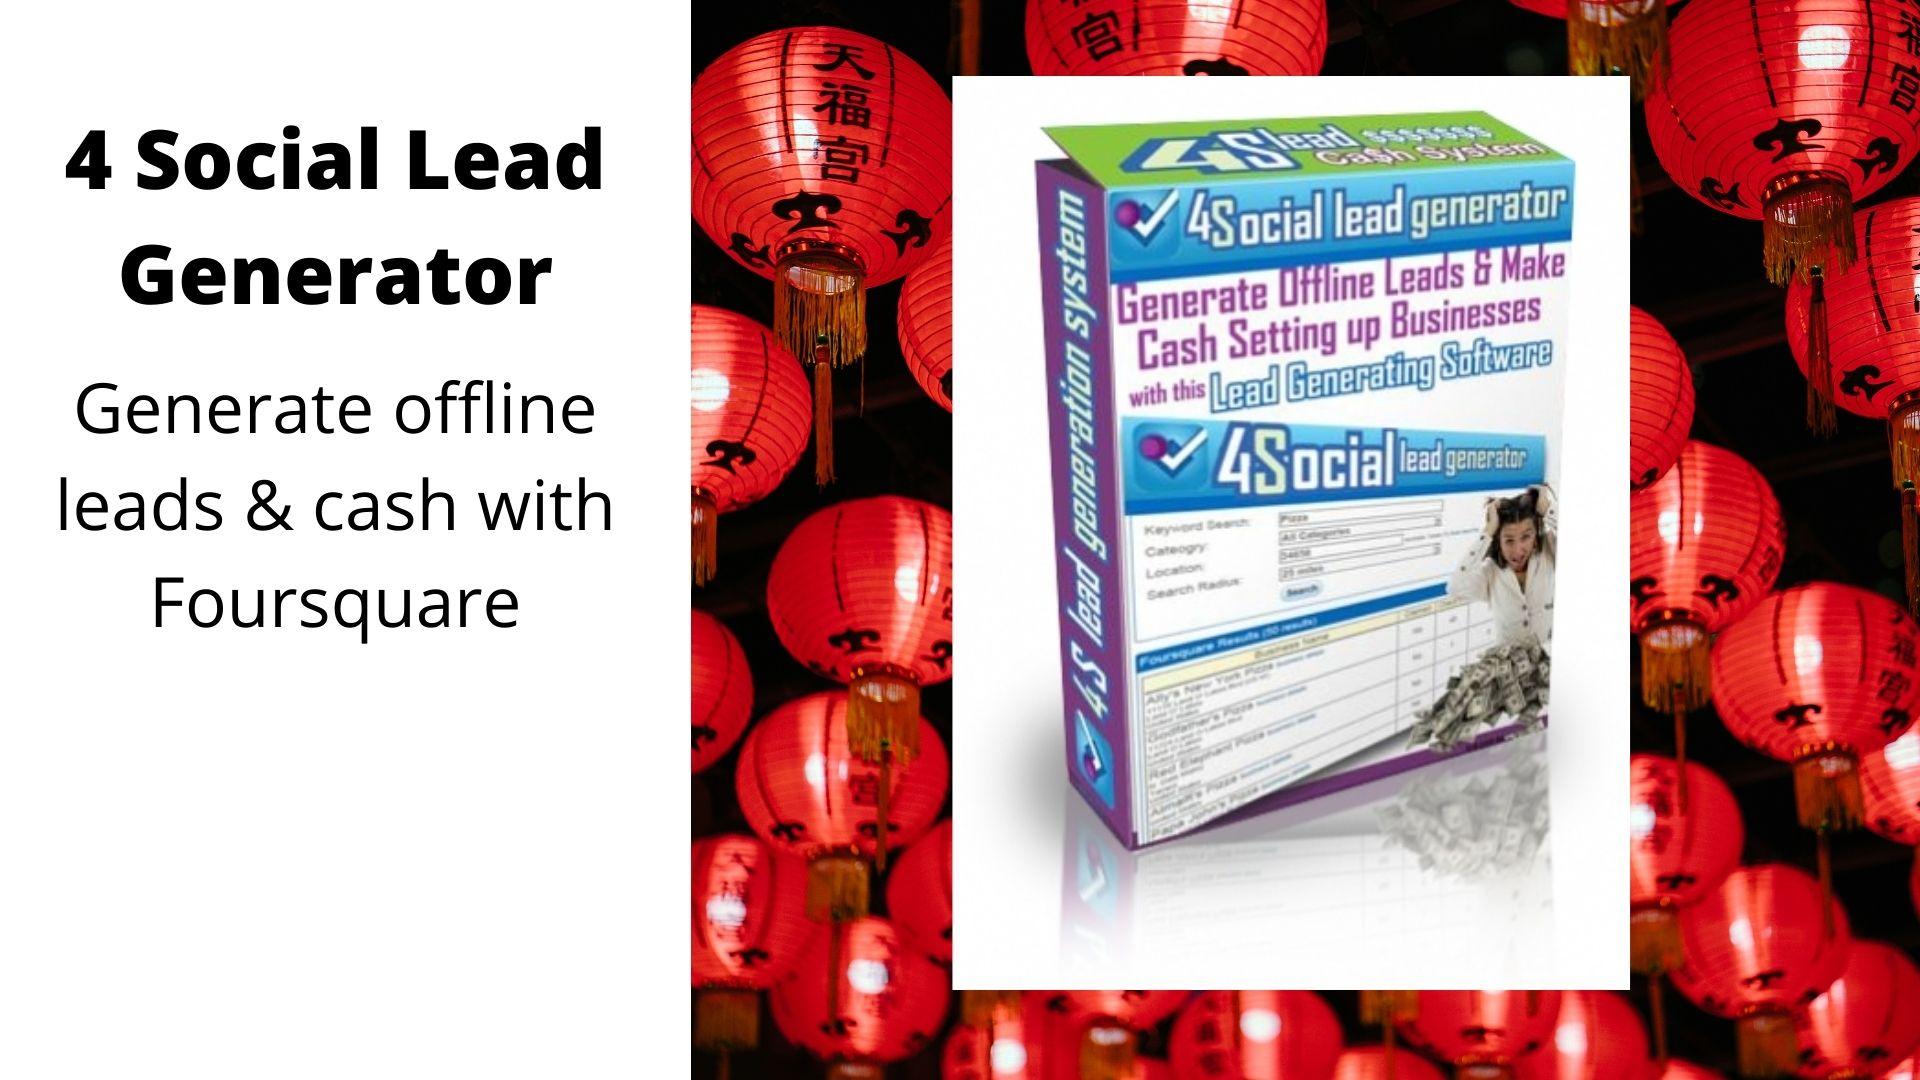 Social Lead Generator Generate Offlice leads & cash